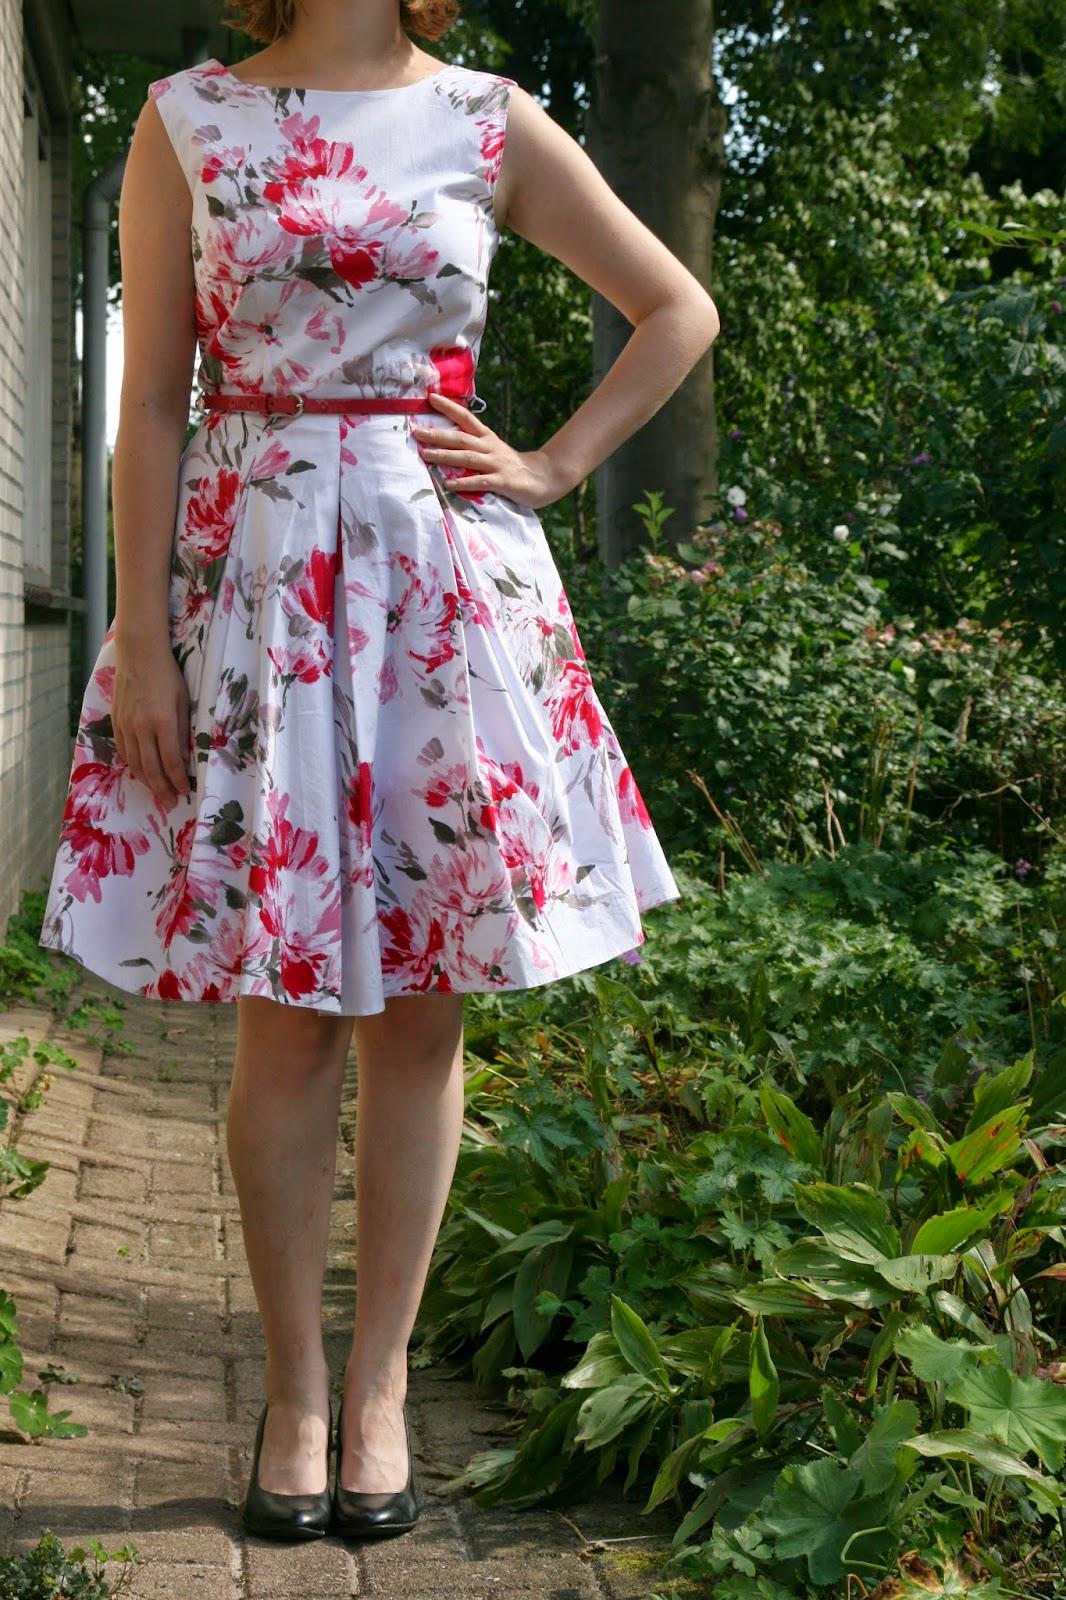 http://hmlovur.blogspot.nl/2014/08/outfits-of-week-week-32.html